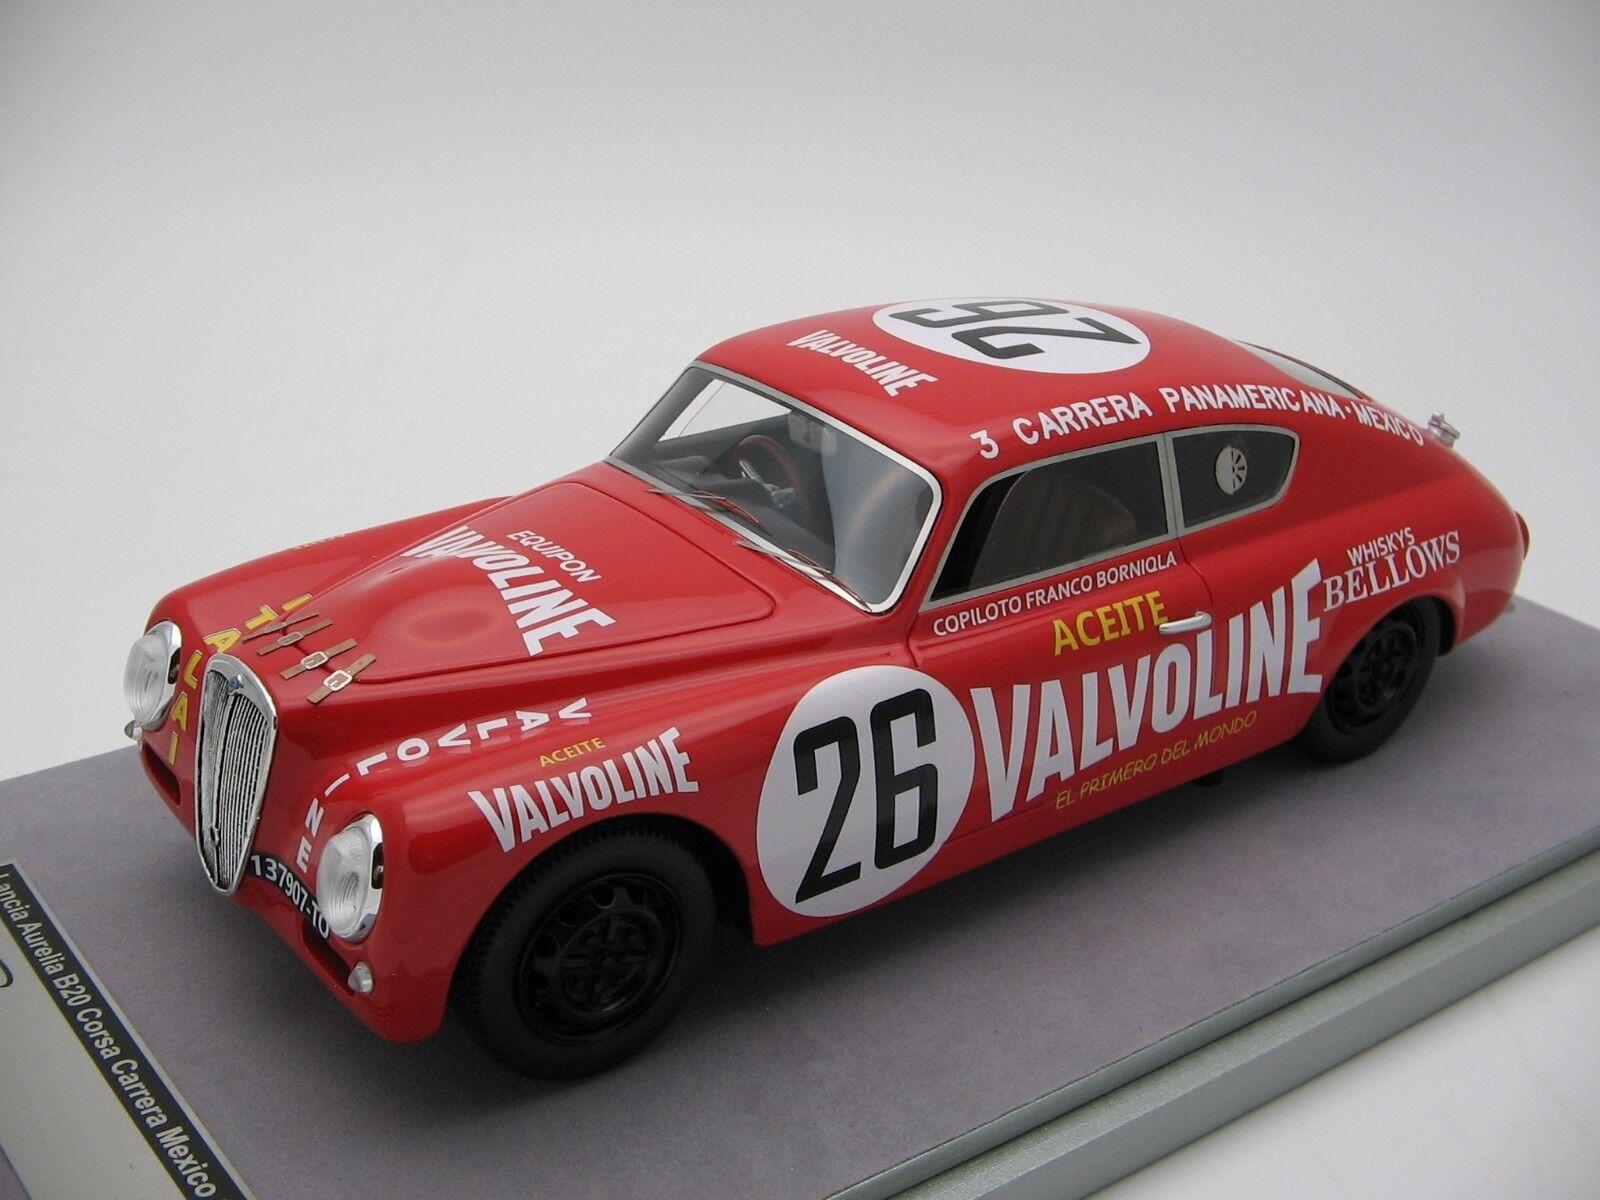 1 18 Scale Tecnomodel Lancia Aurelia b20 corsa Carrera Mexico 1952 tm18-69a